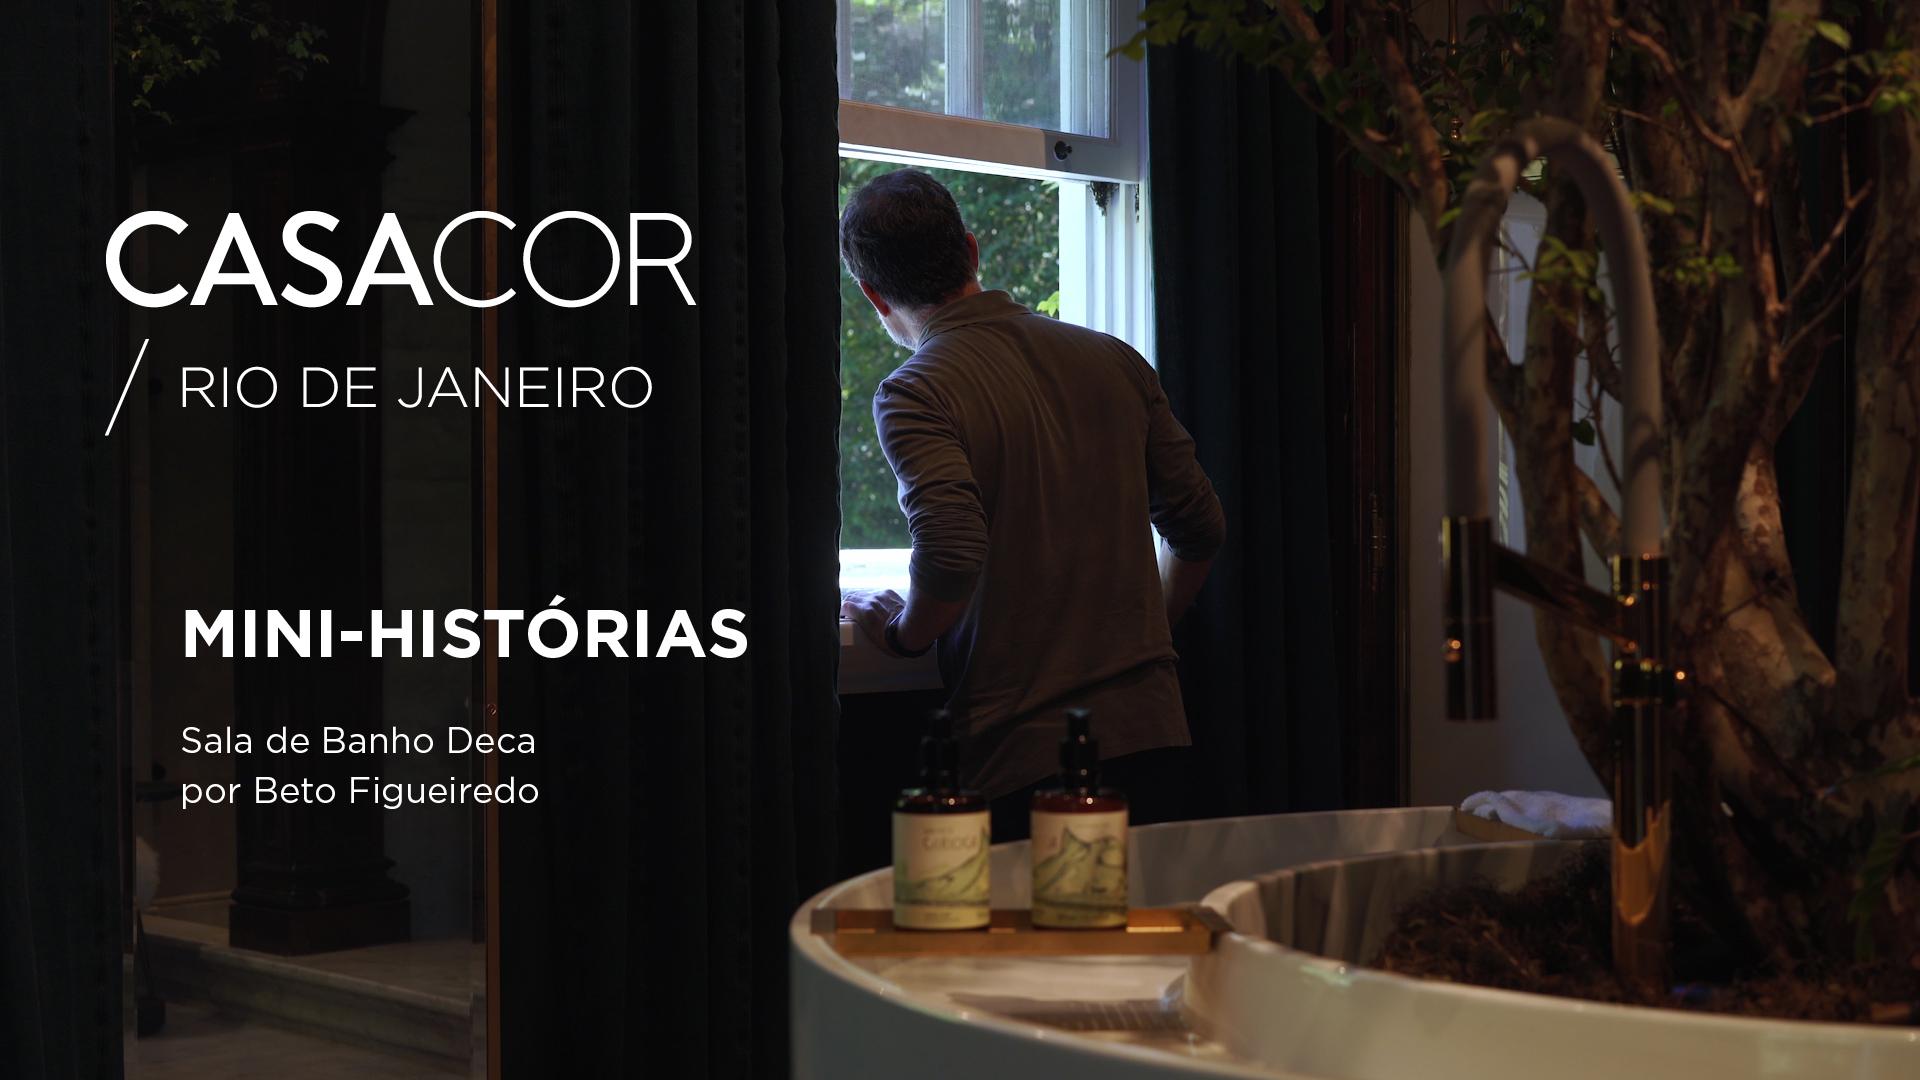 Mini-histórias CASACOR Rio 30 anos: confira os novos capítulos da série